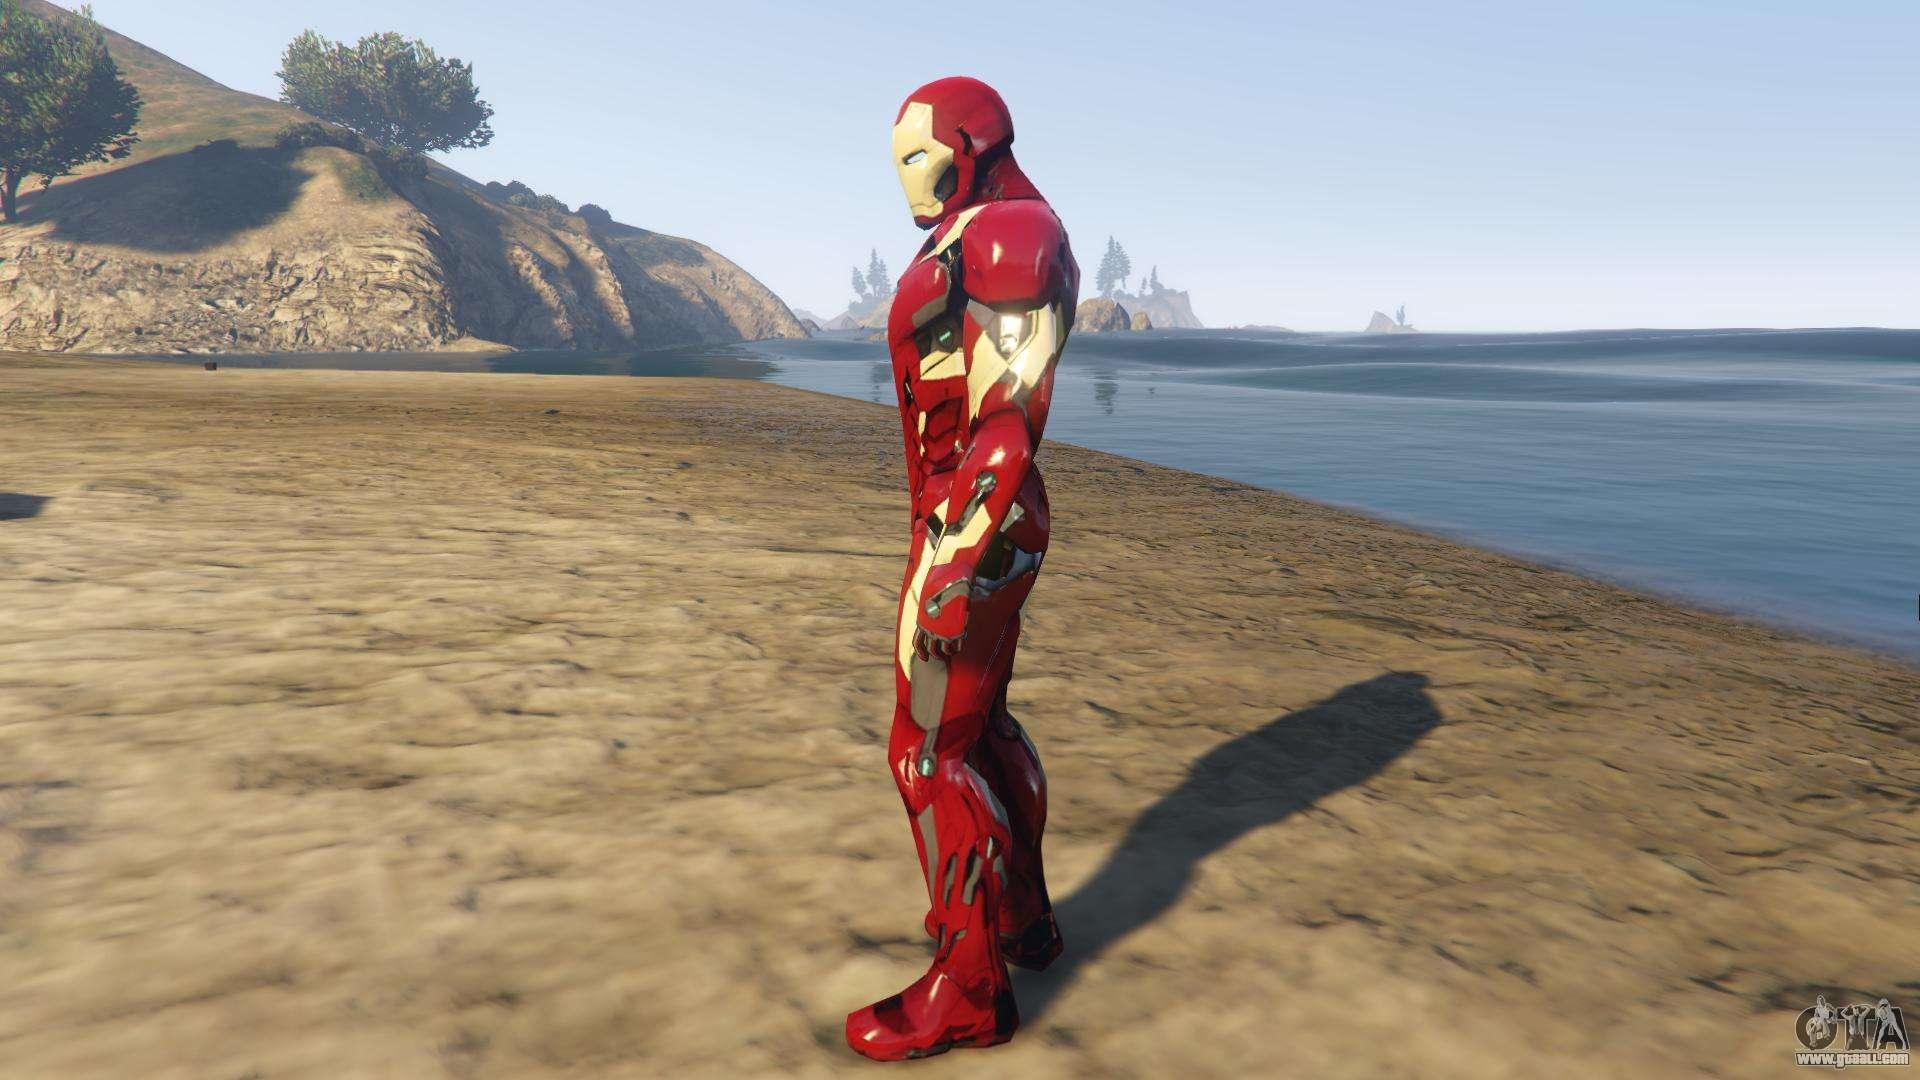 gta 5 ironman mod download ps3